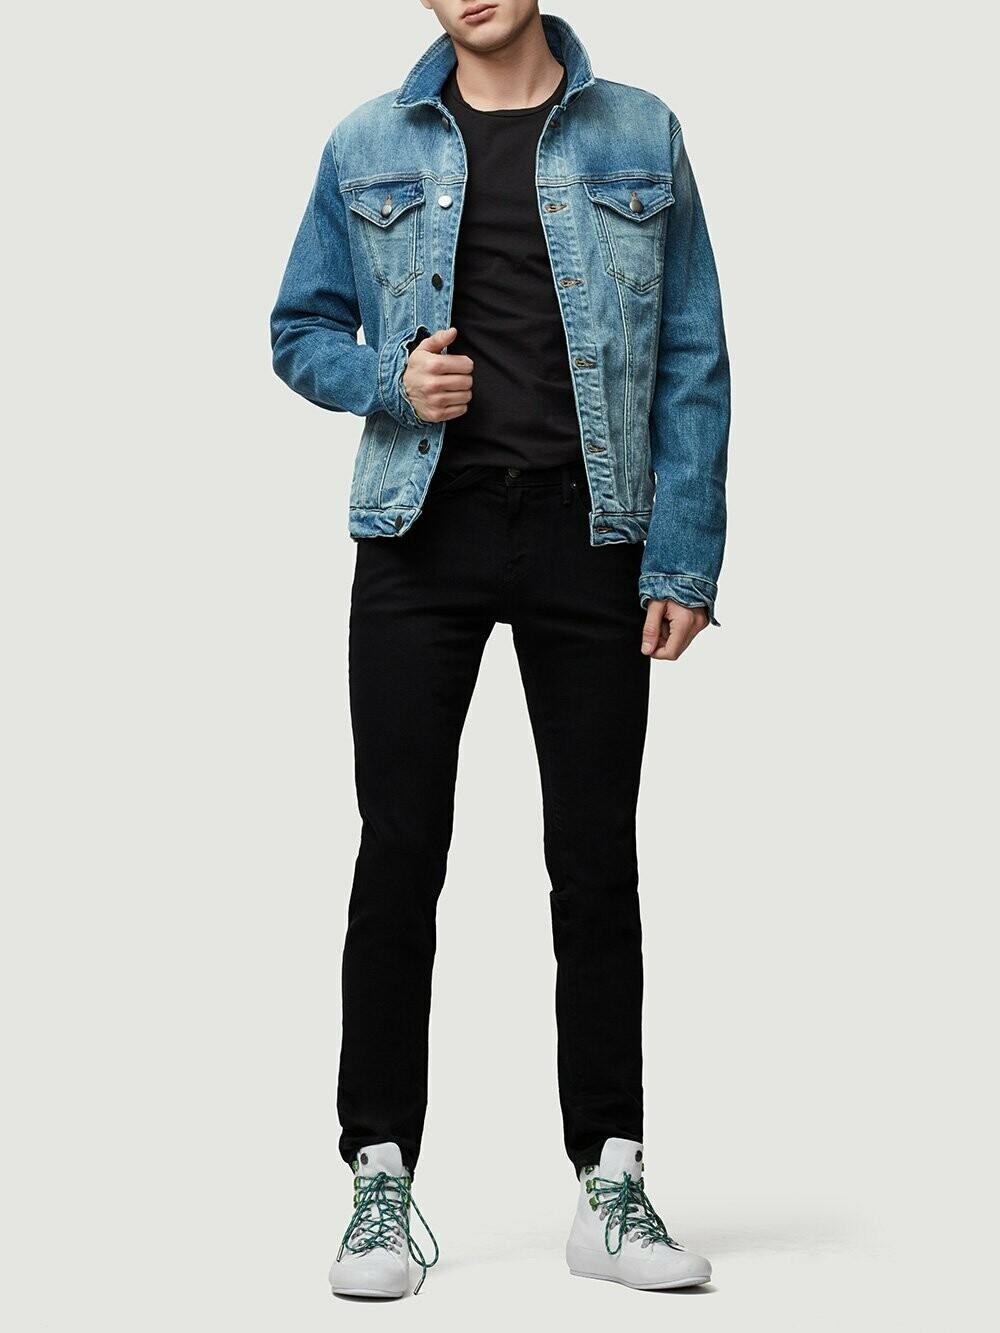 Frame L'Homme Skinny Jeans in Noir